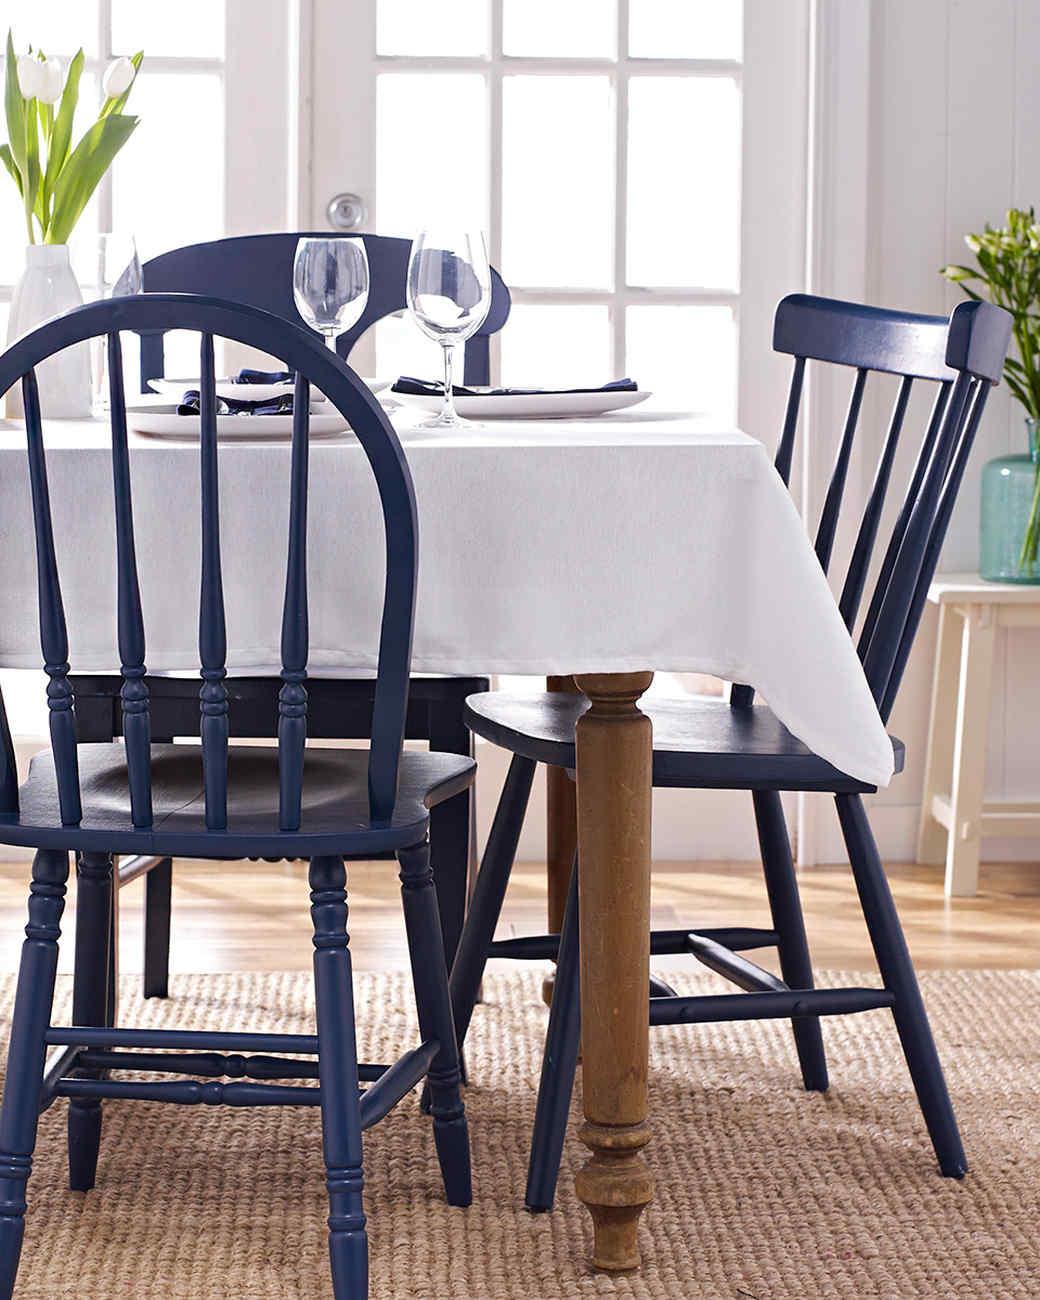 Painted Wooden Chairs  Martha Stewart